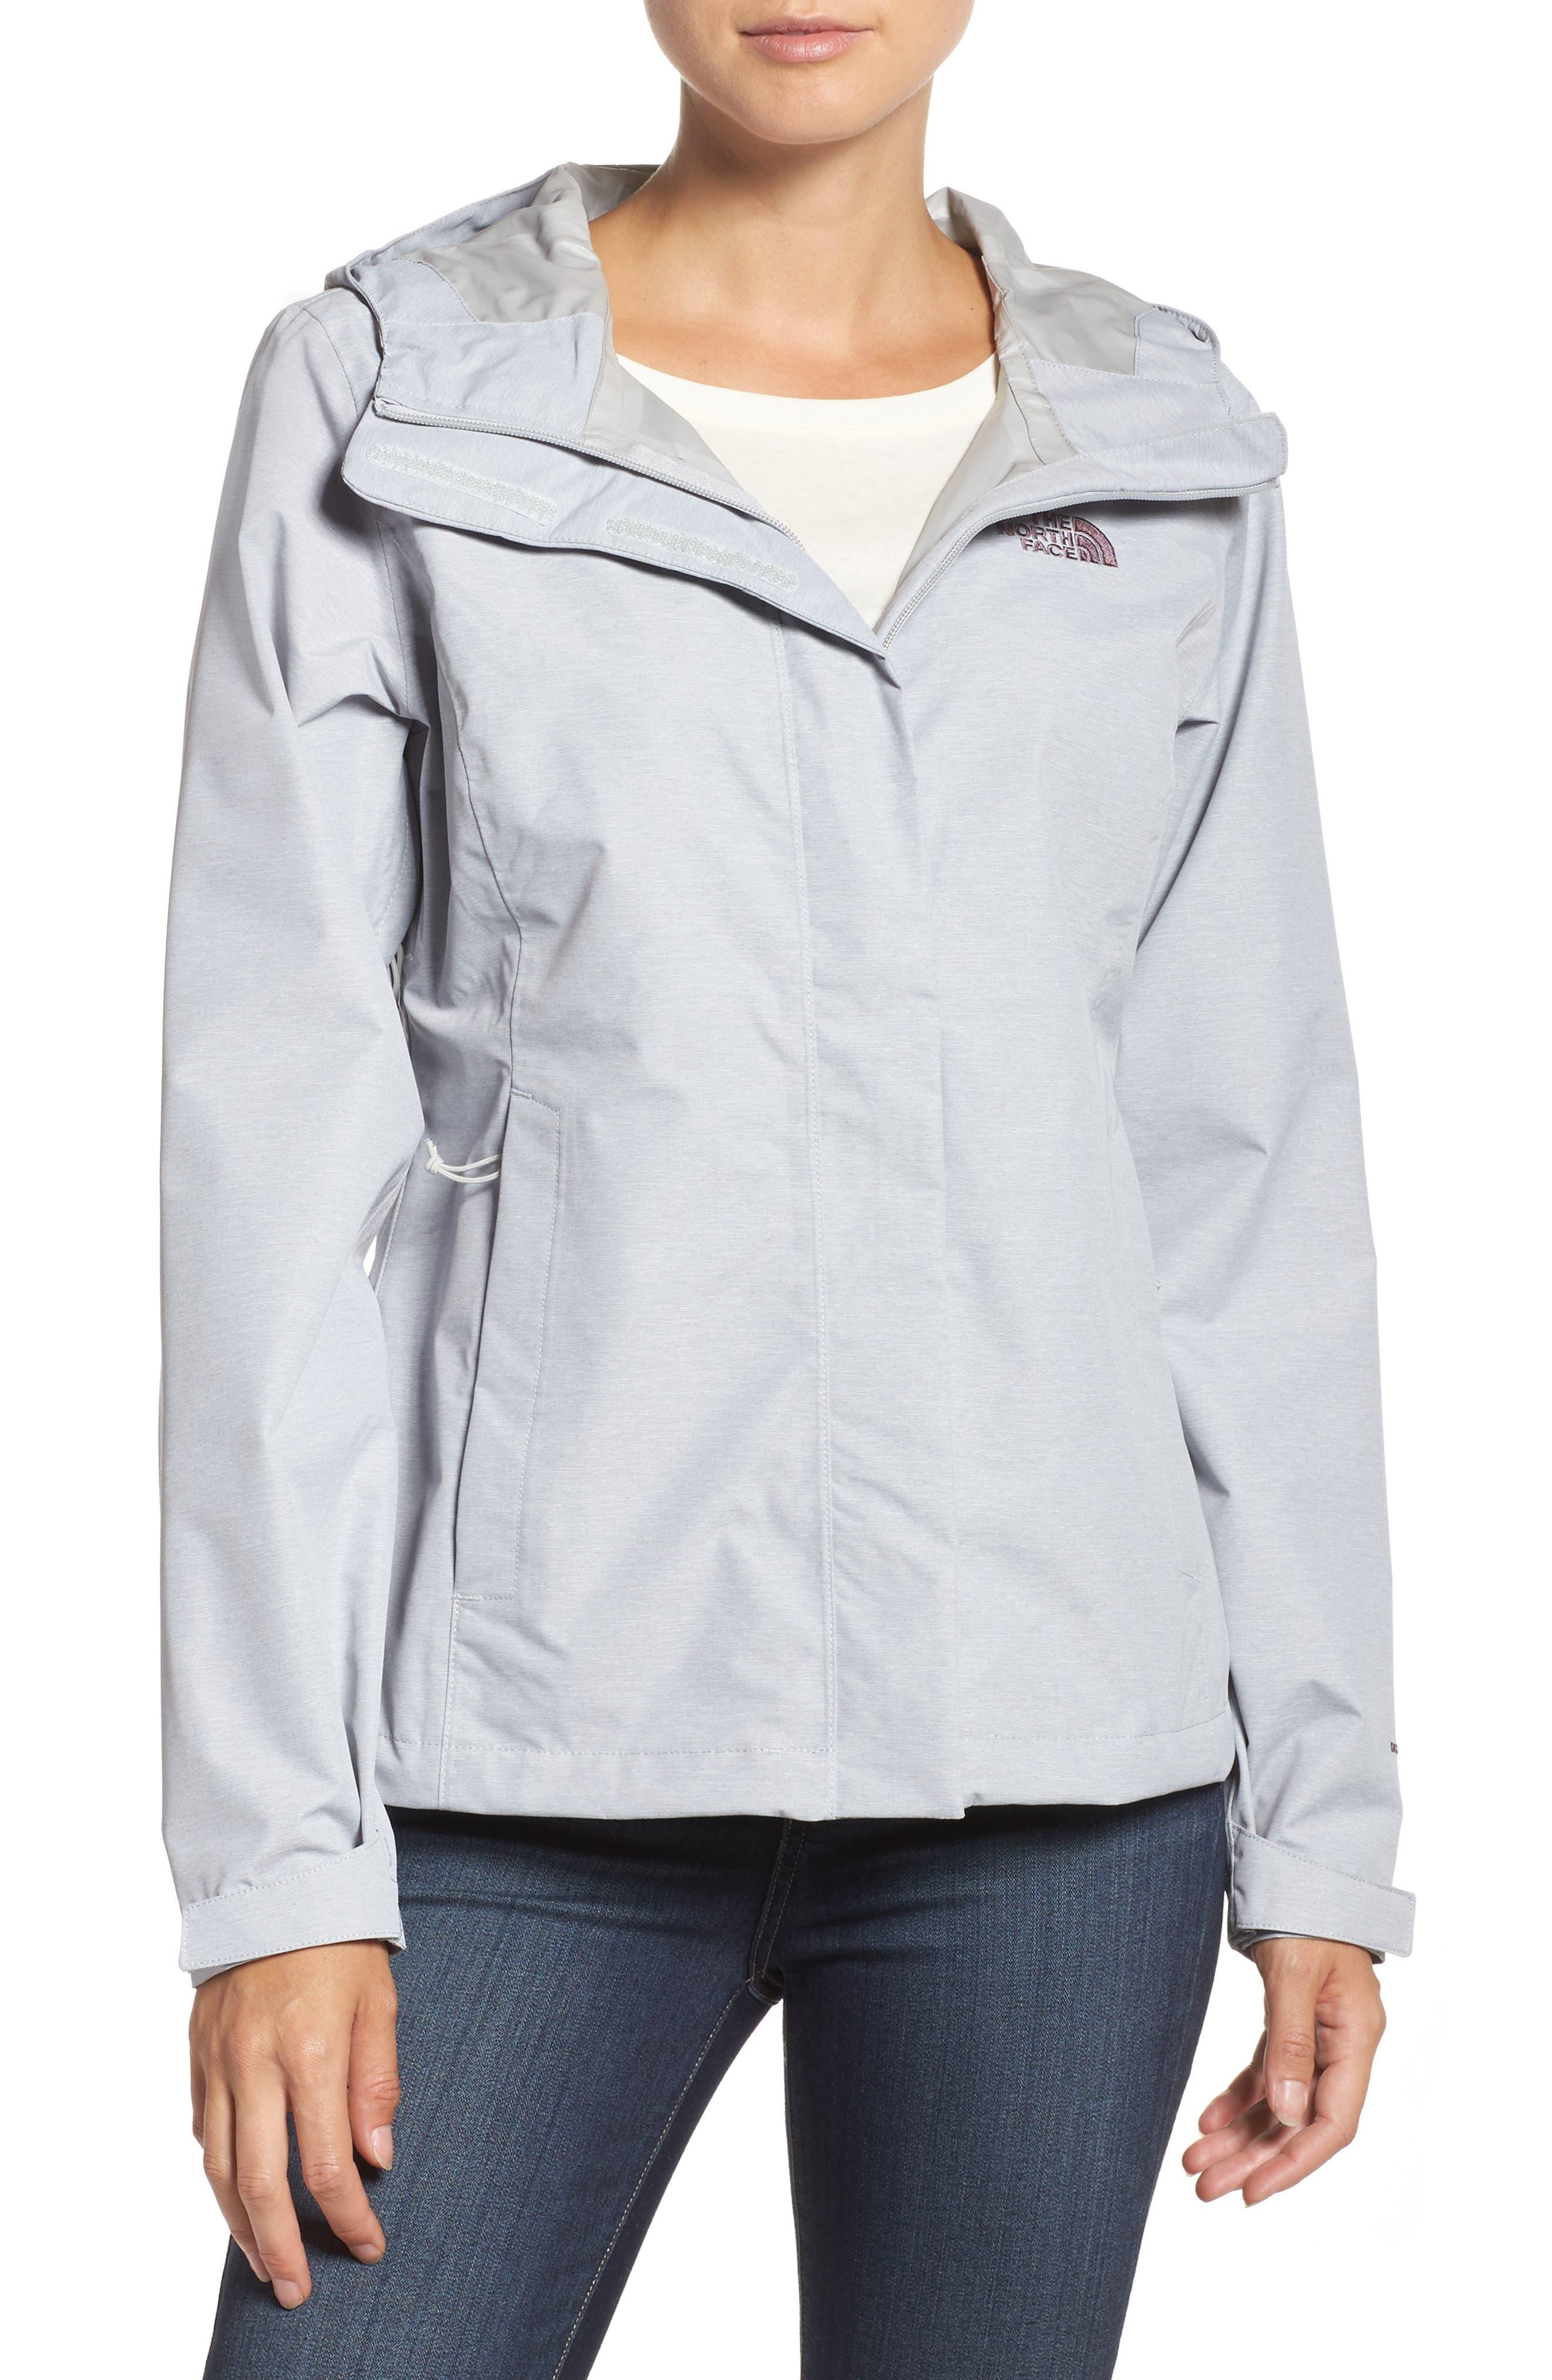 The North Face Venture 2 Waterproof Jacket